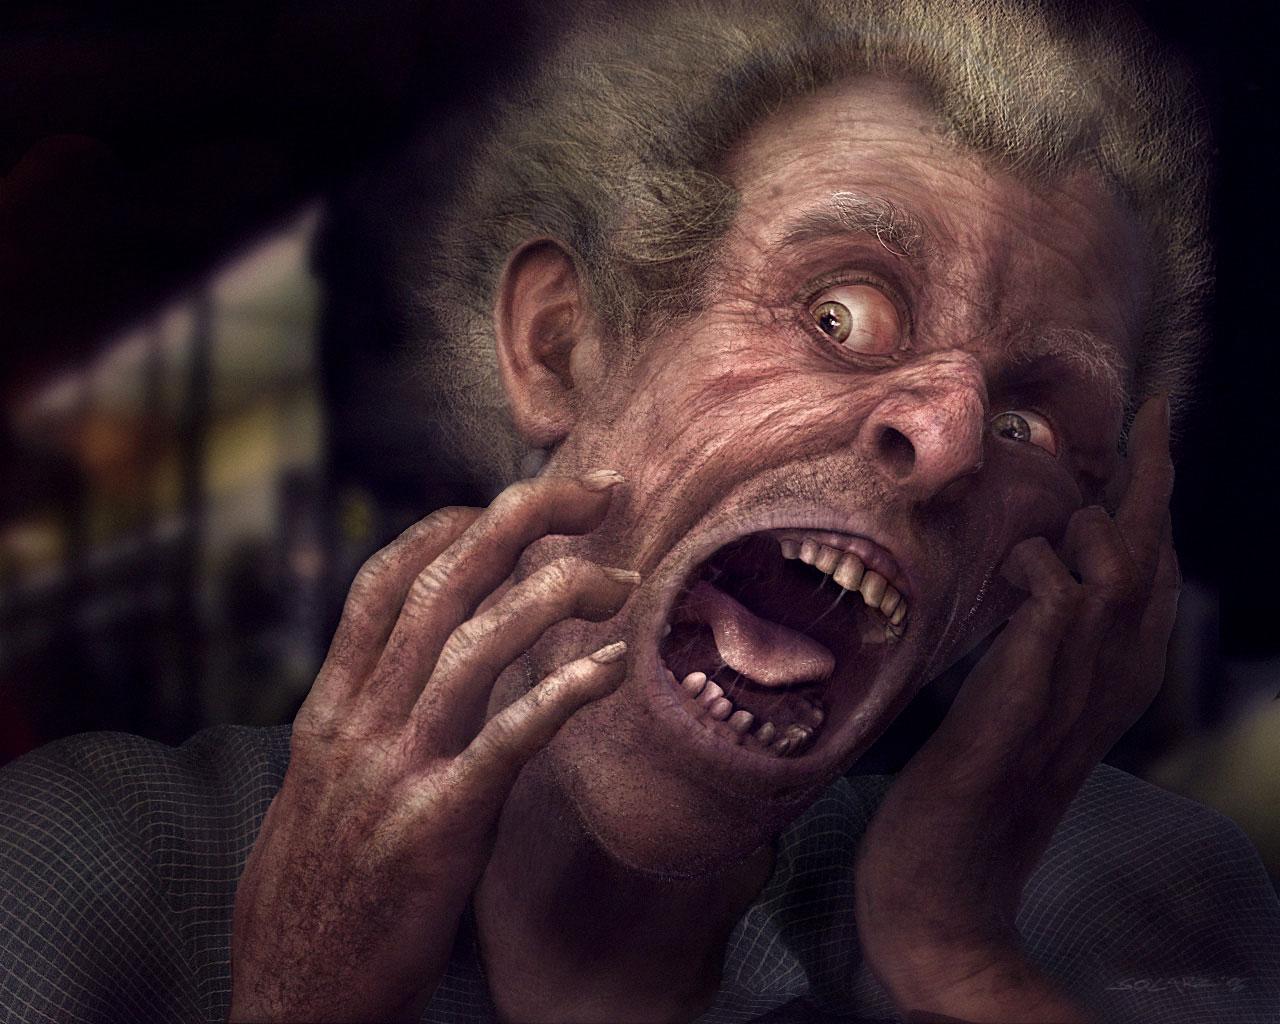 http://4.bp.blogspot.com/_f0wZzvvr1_A/TLlUH6NBOeI/AAAAAAAACo0/Q48GWwZgToM/s1600/Horror+HQ+Wallpapers+(5).jpg